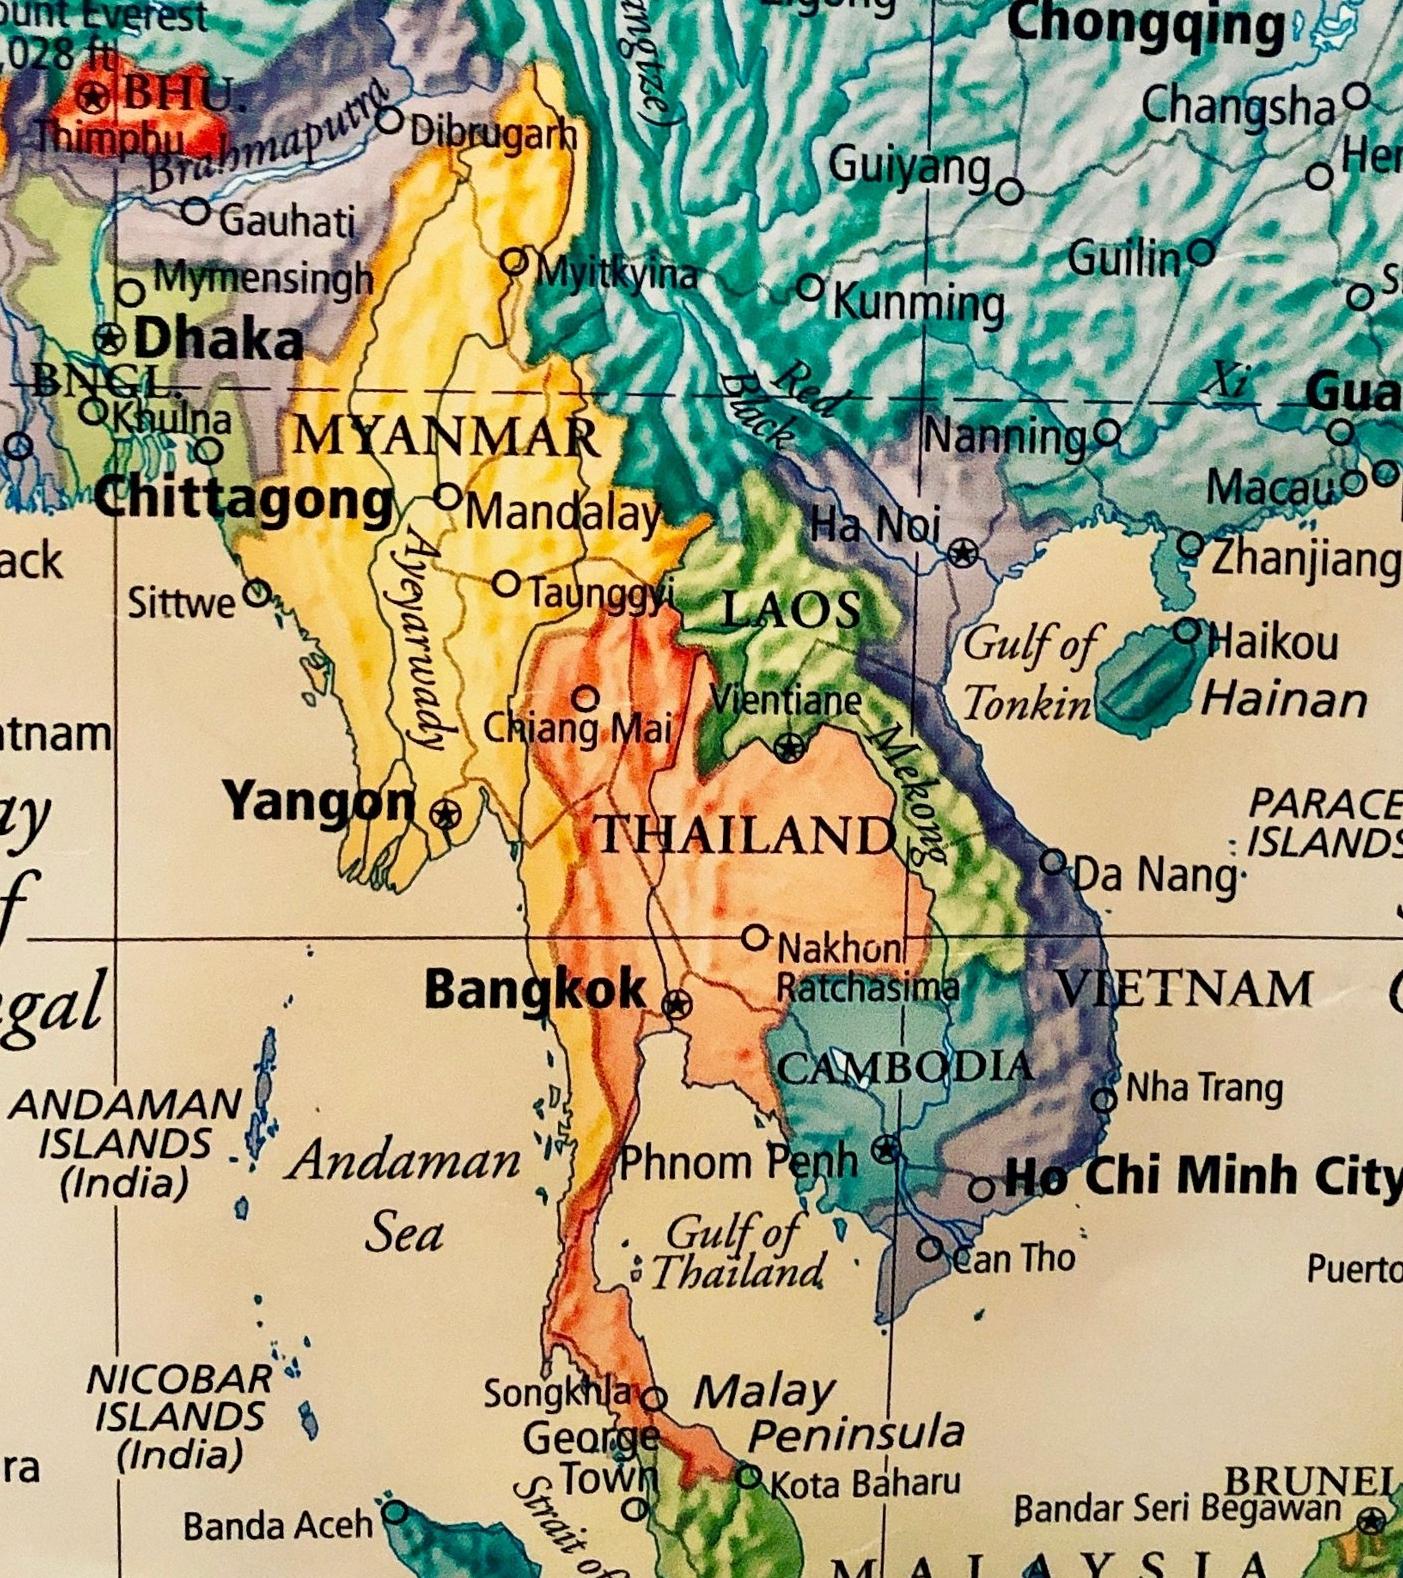 southeast asia map.JPG